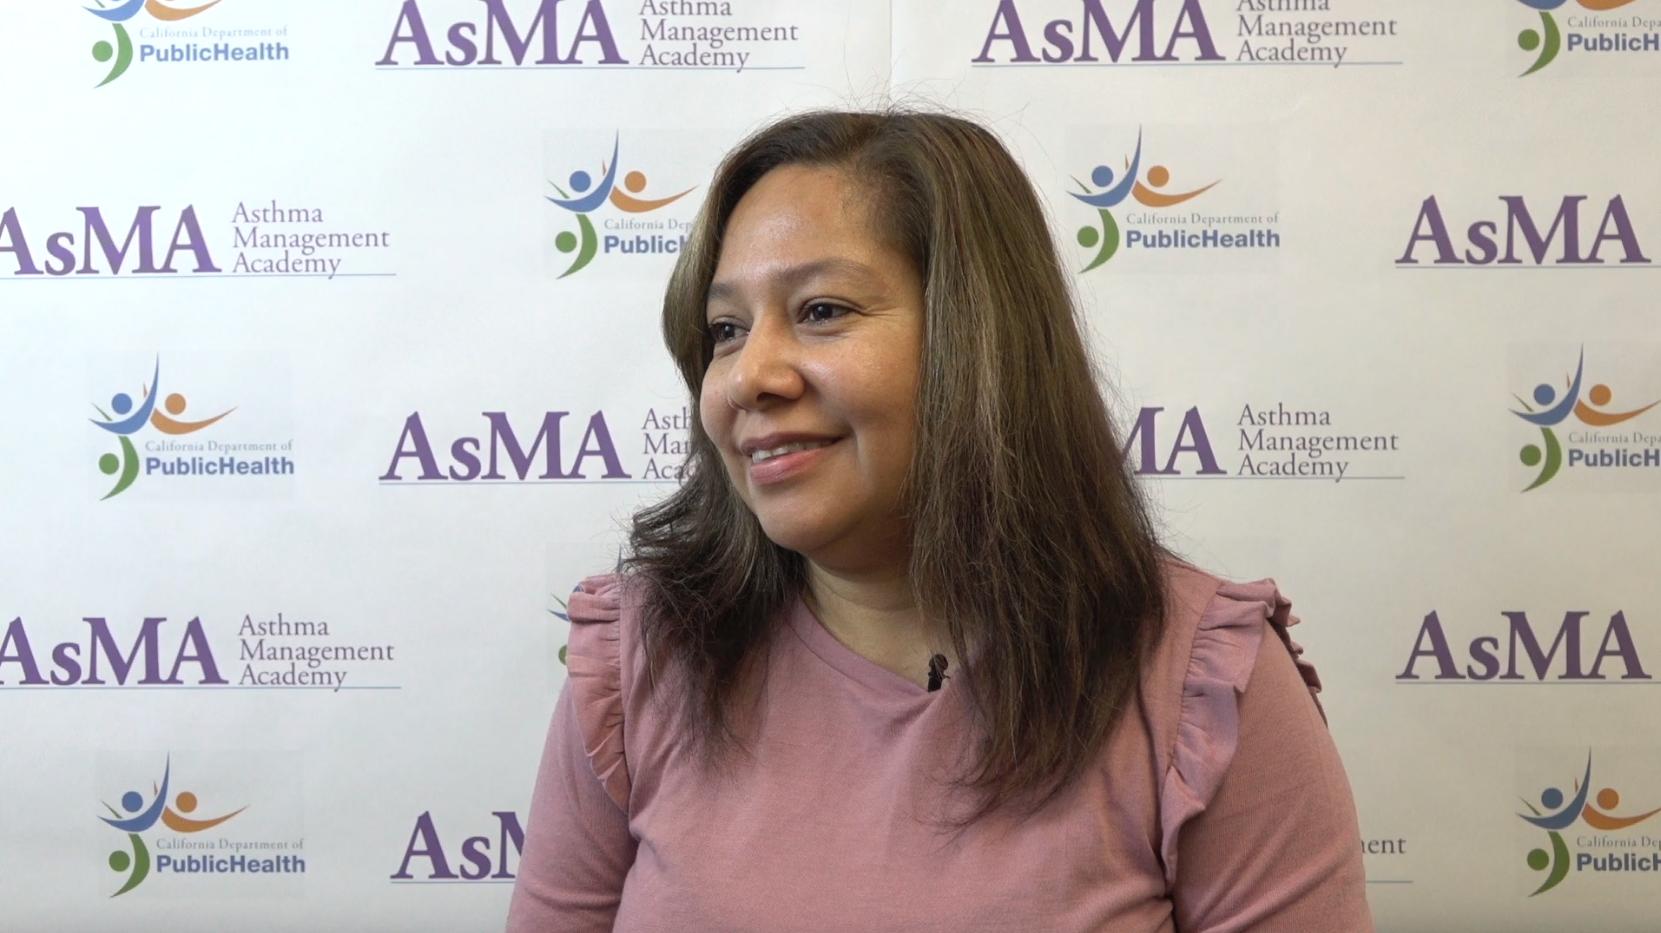 CDPH Asthma Management Academy - Gabriela's Story